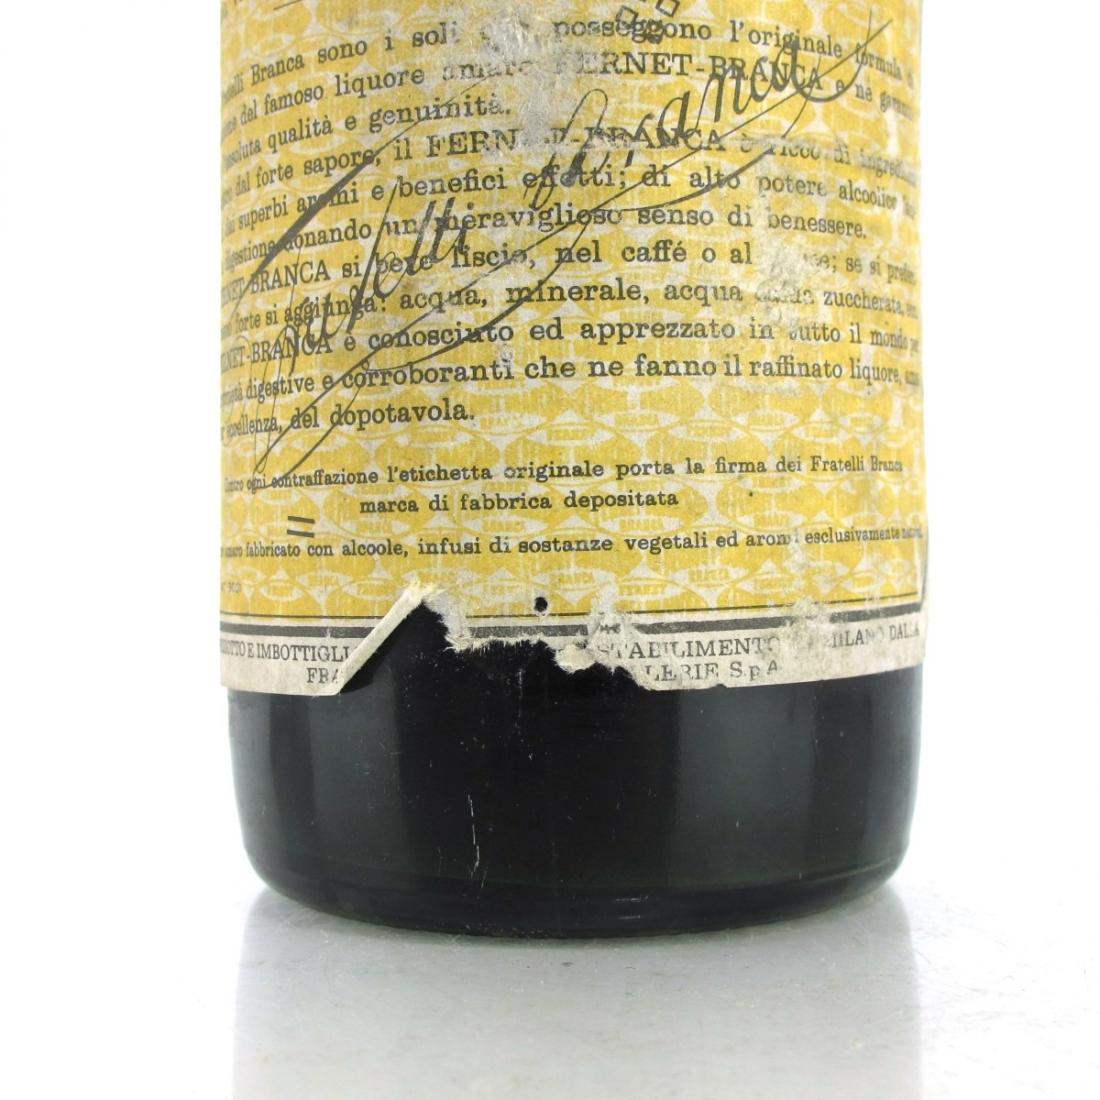 Fernet-Branca Digestif 1 Litre 1960s